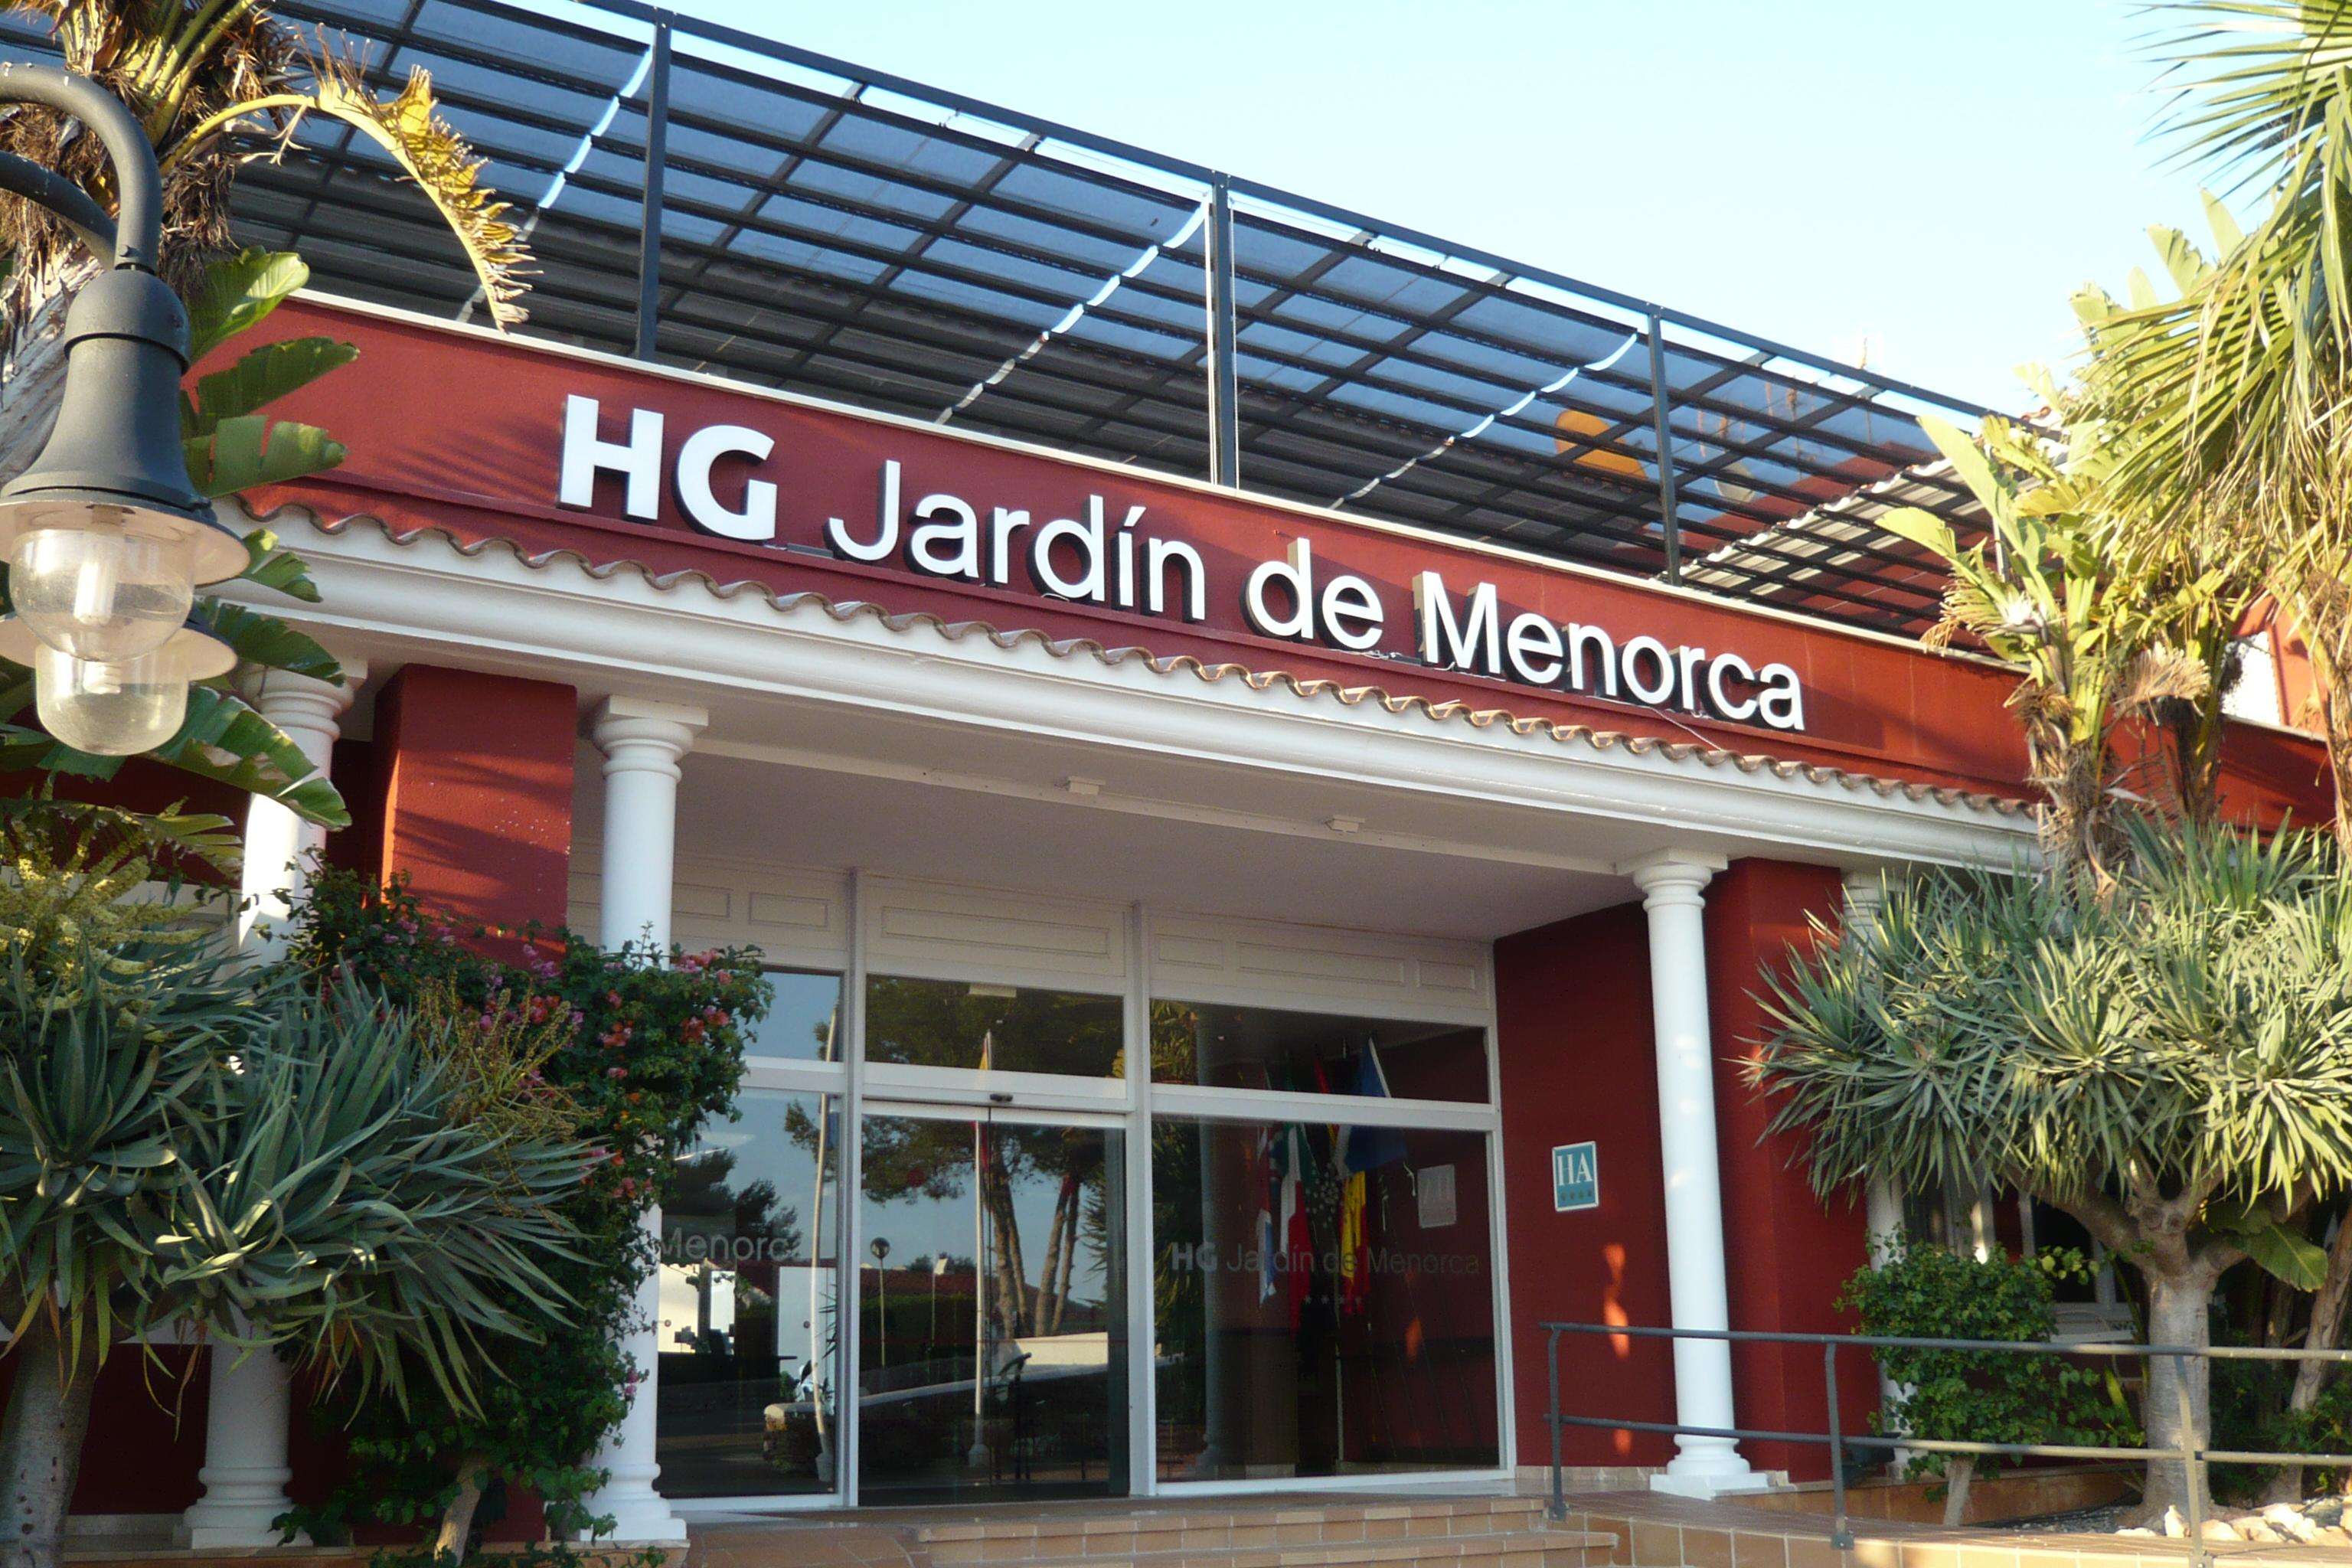 Aparthotel HG Jardin de Menorca en San Jaime Mediterr neo Menorca